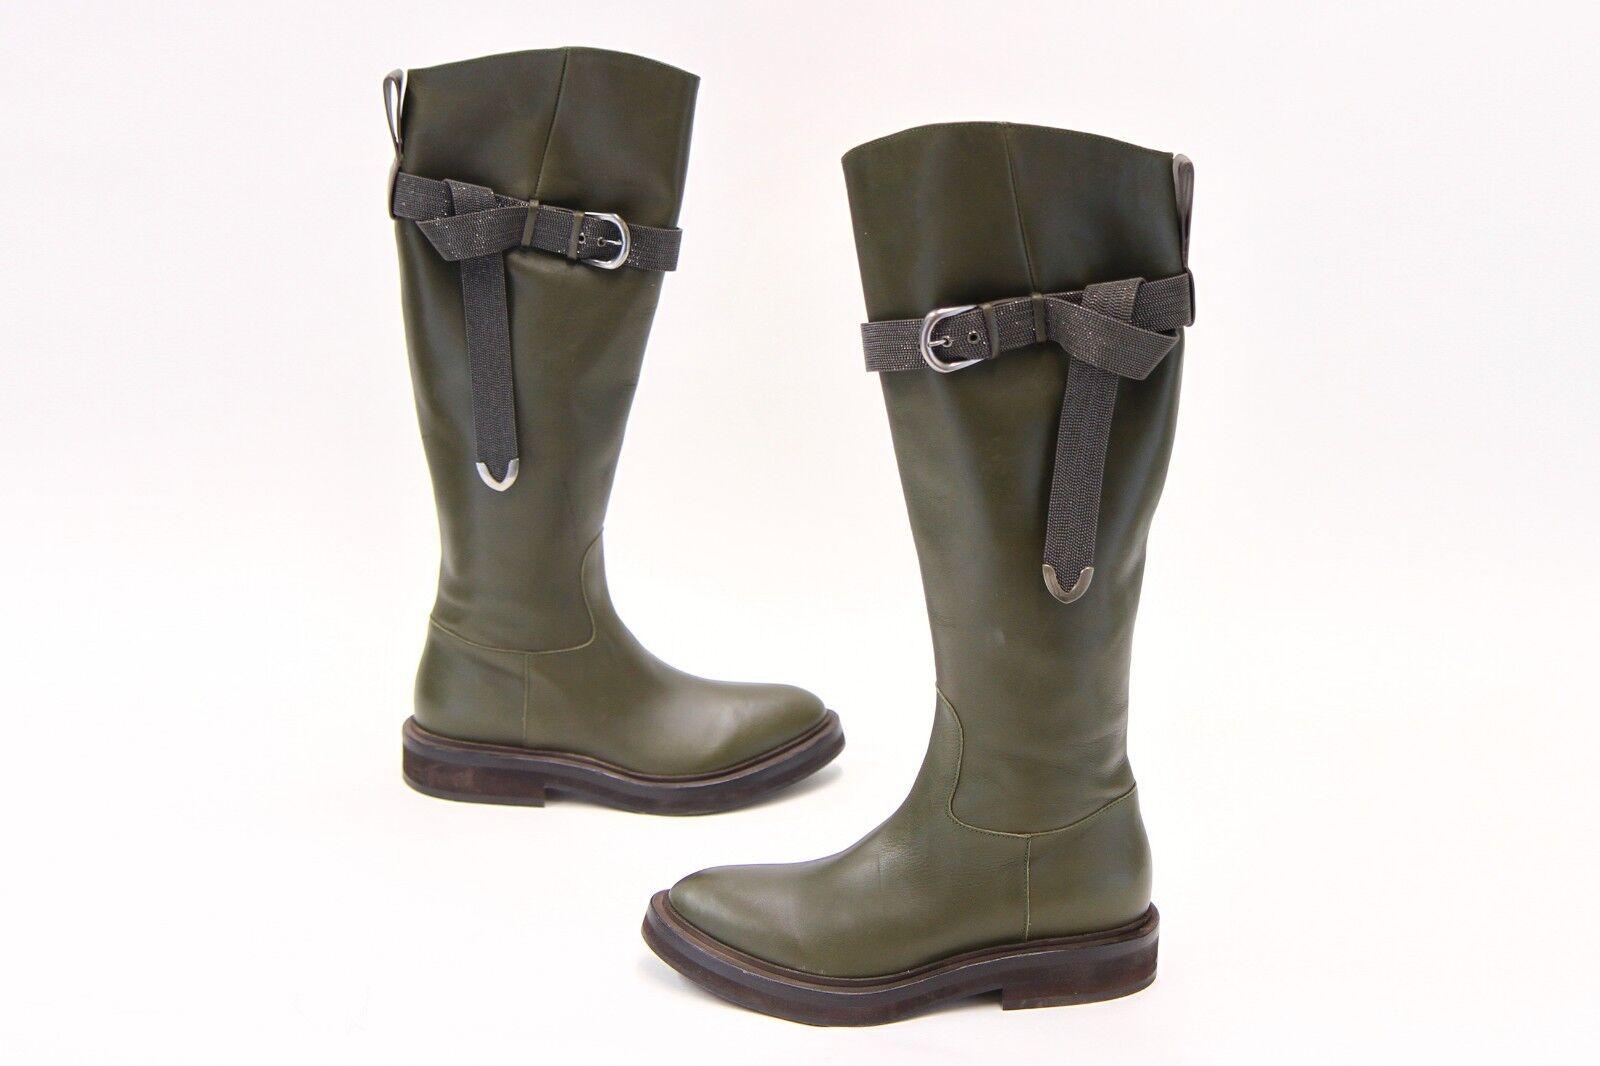 NWD  2995 Brunello Cucinelli Monili Bead Strap Leather Riding Boot 37 7 US A181